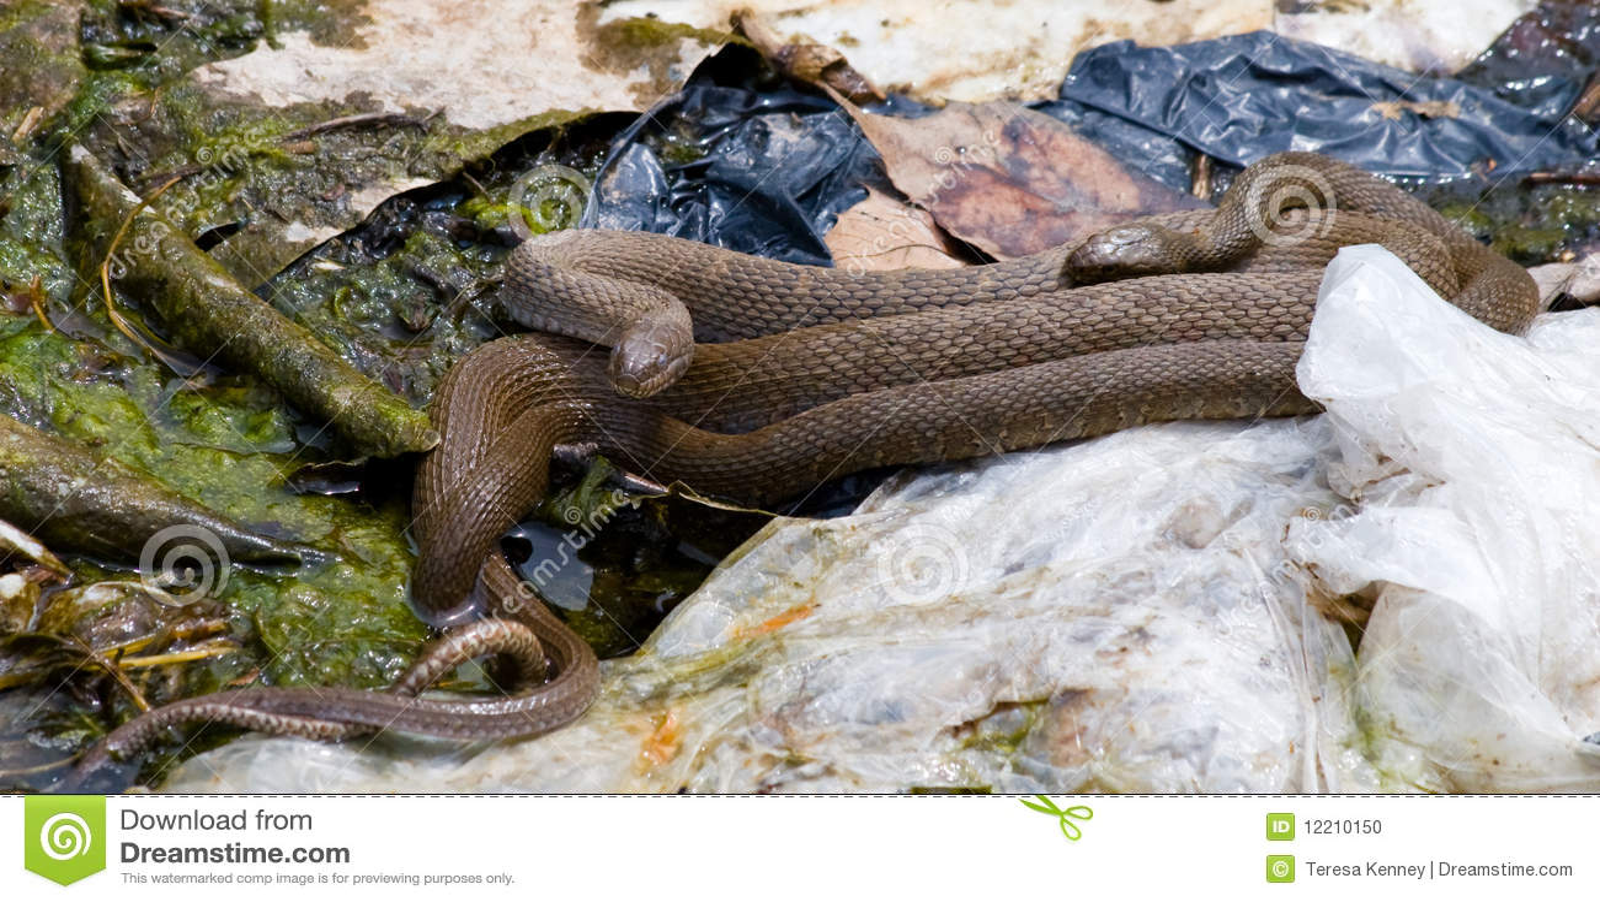 Brown Northern Water Snake